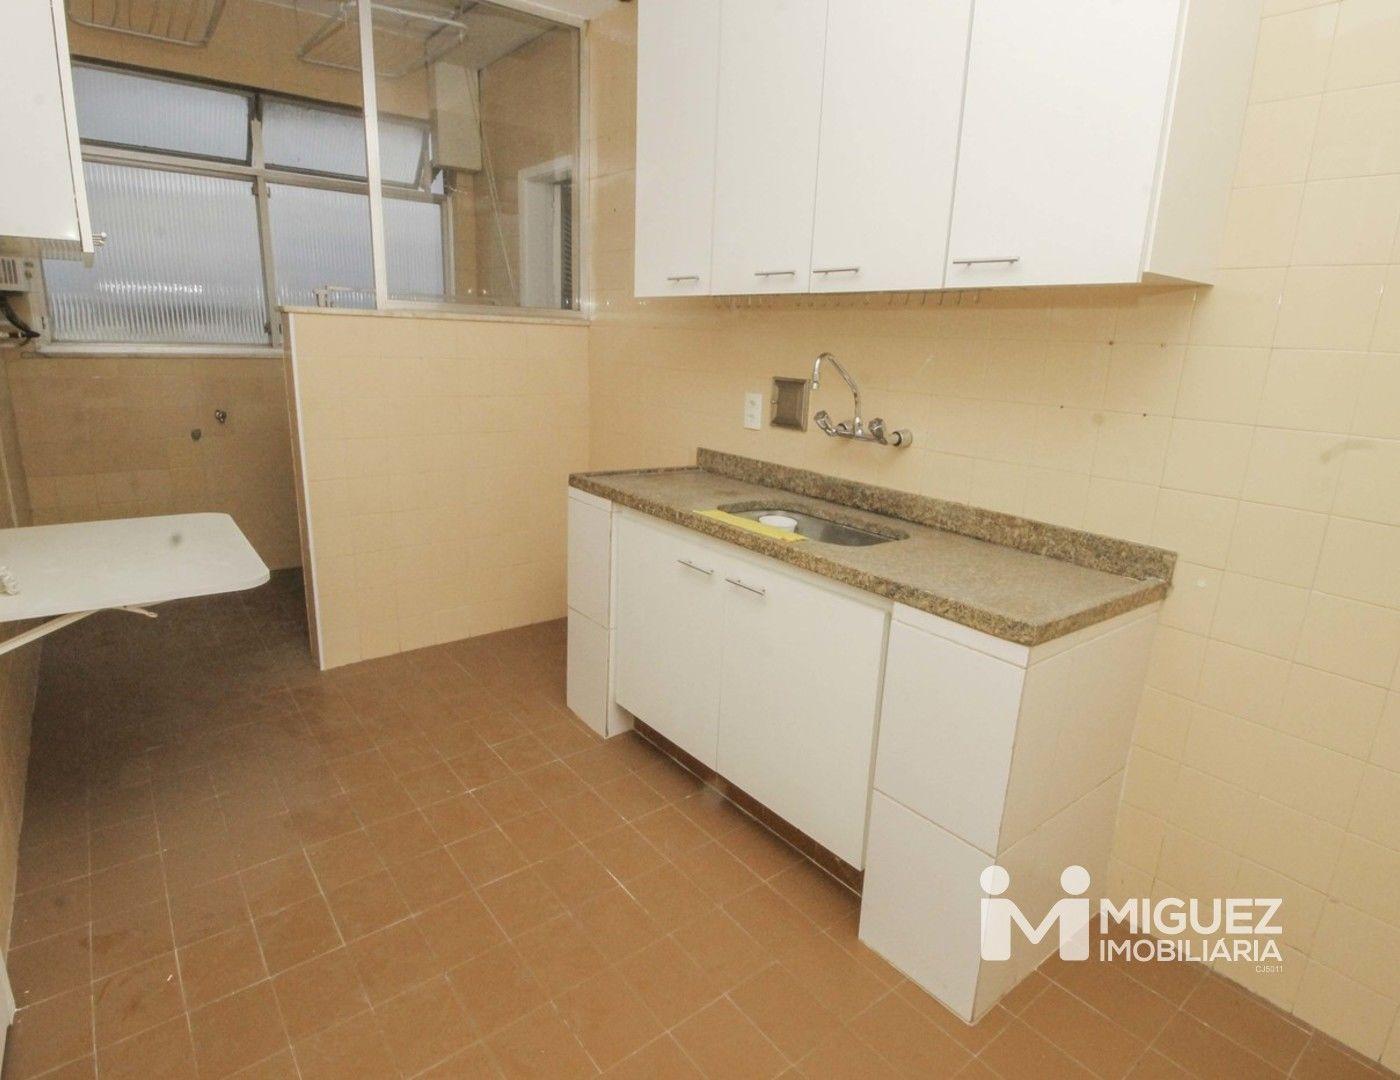 Apartamento, aluguel, Rua Campos Sales - Tijuca , Rio de janeiro